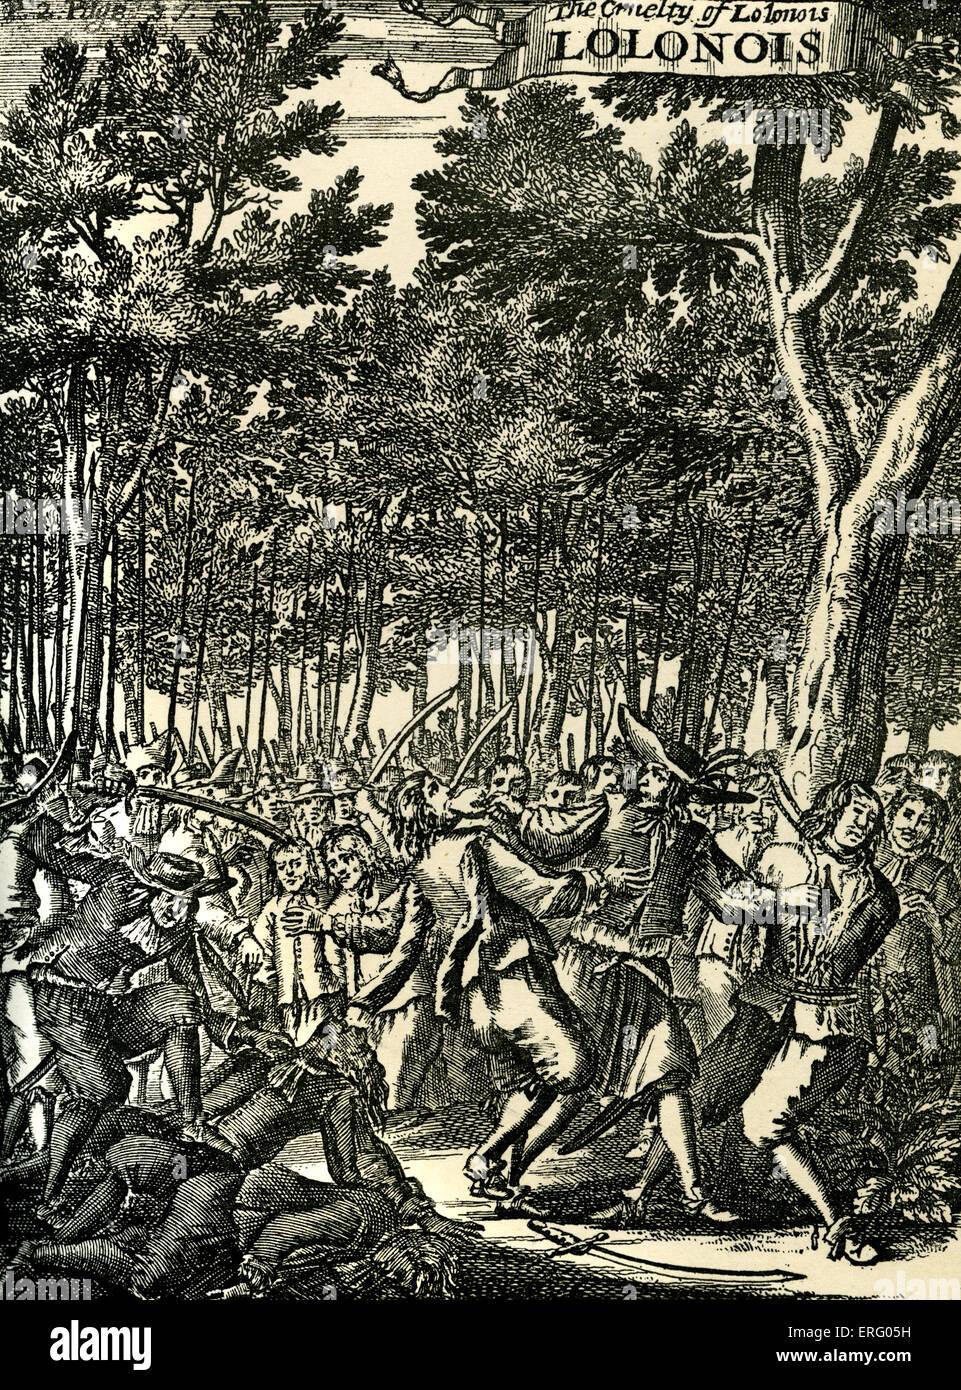 The Cruelty of Lolonois, engraving. (Jean-David Nau, François L'Olonnais, L'Olonnois, Lolona). The French buccaneer, Stock Photo